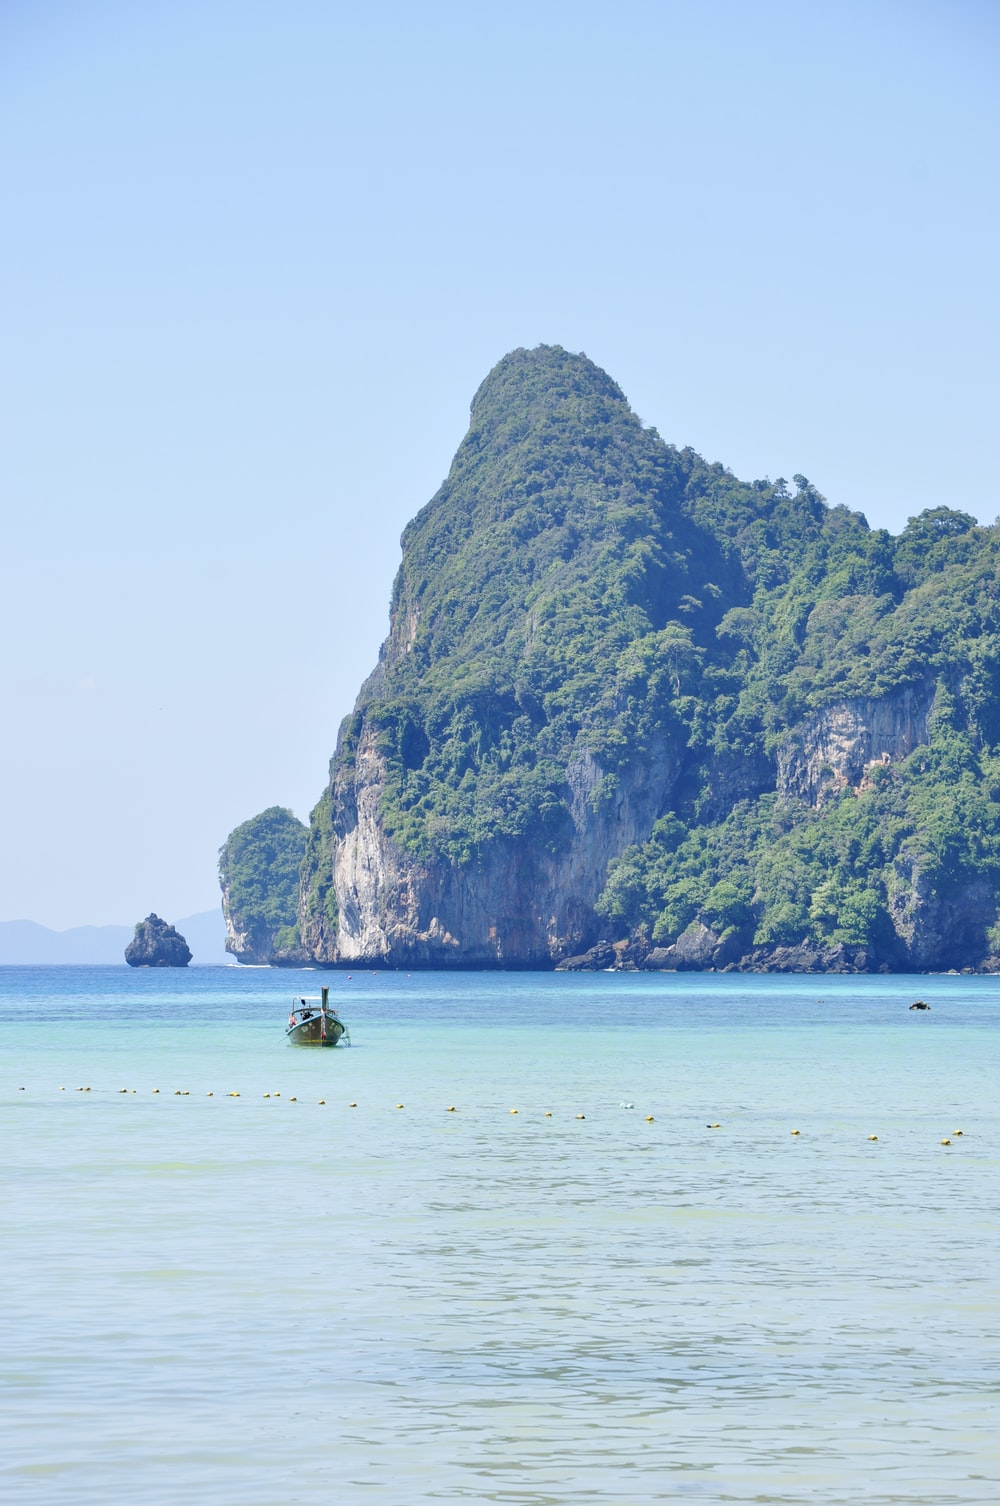 boat on sea far away from island